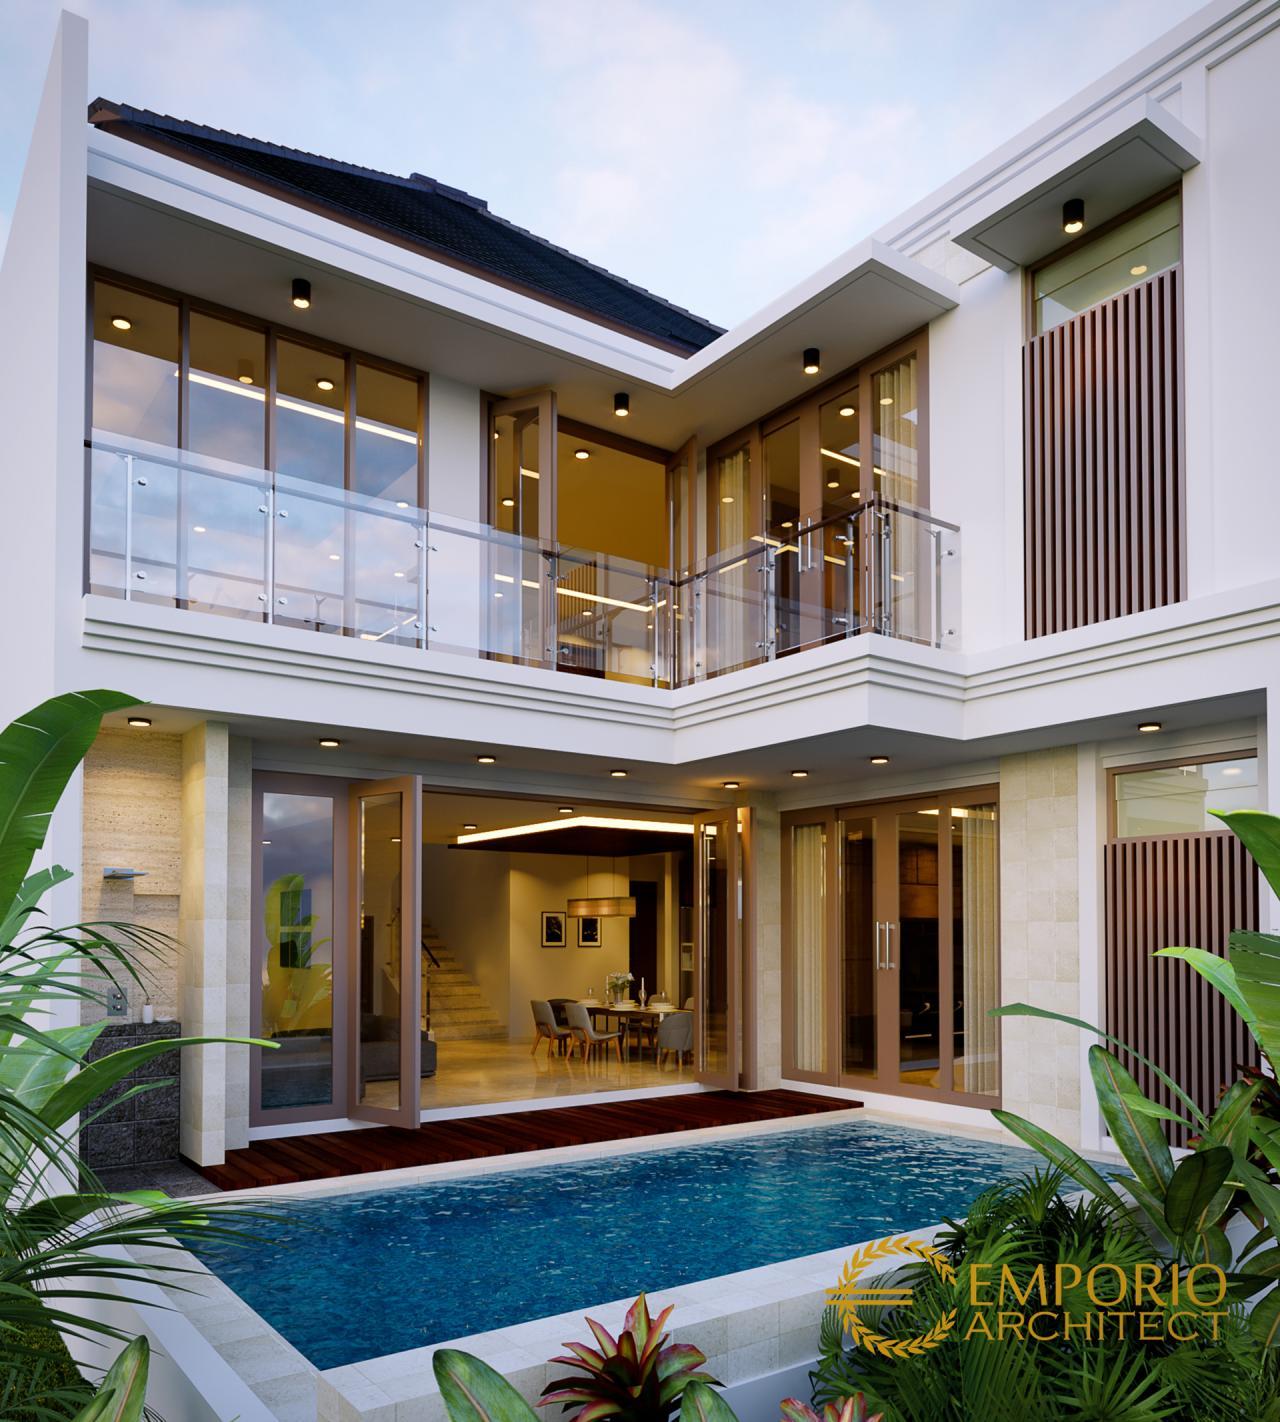 Emporio Arsitek: Desain Rumah Villa Bali 2 Lantai Bapak Fahmi II Di